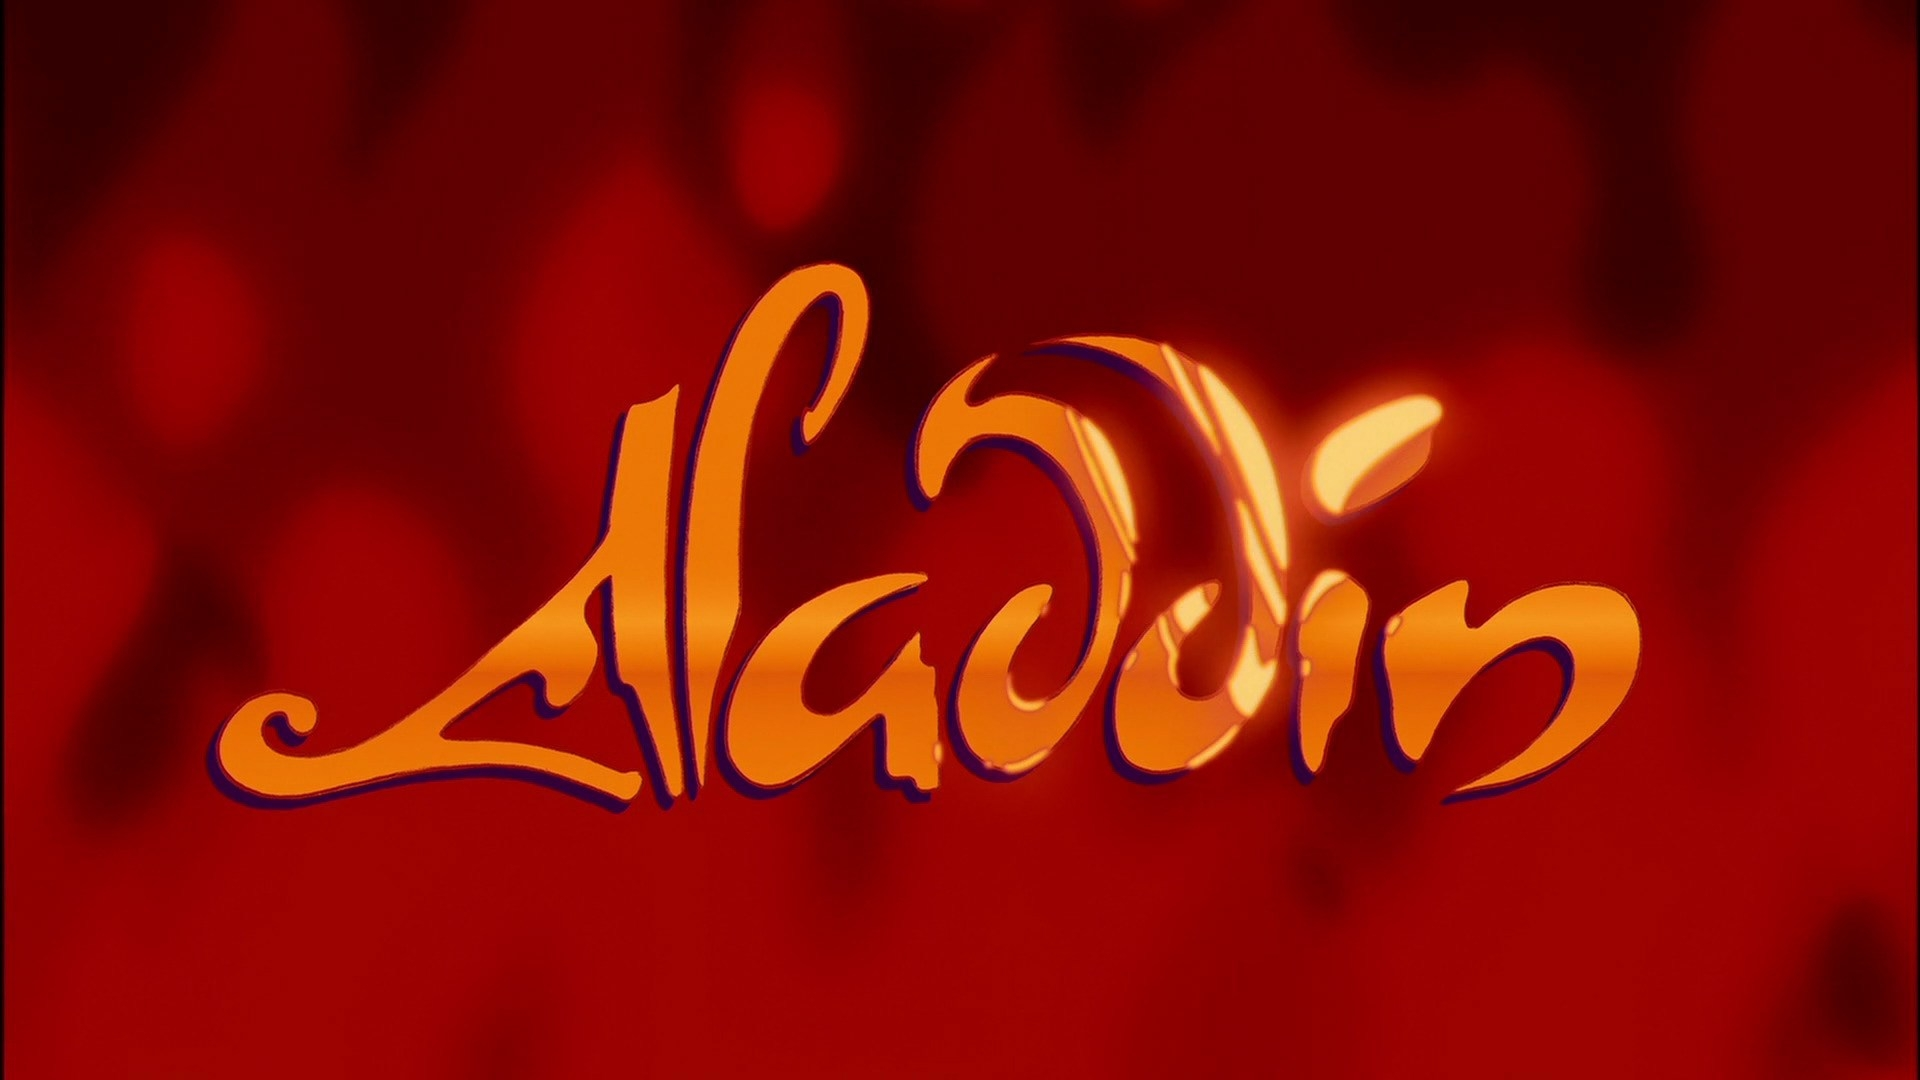 Aladdin (Disneys Sweden) (@adriennebernardo1) Cover Image